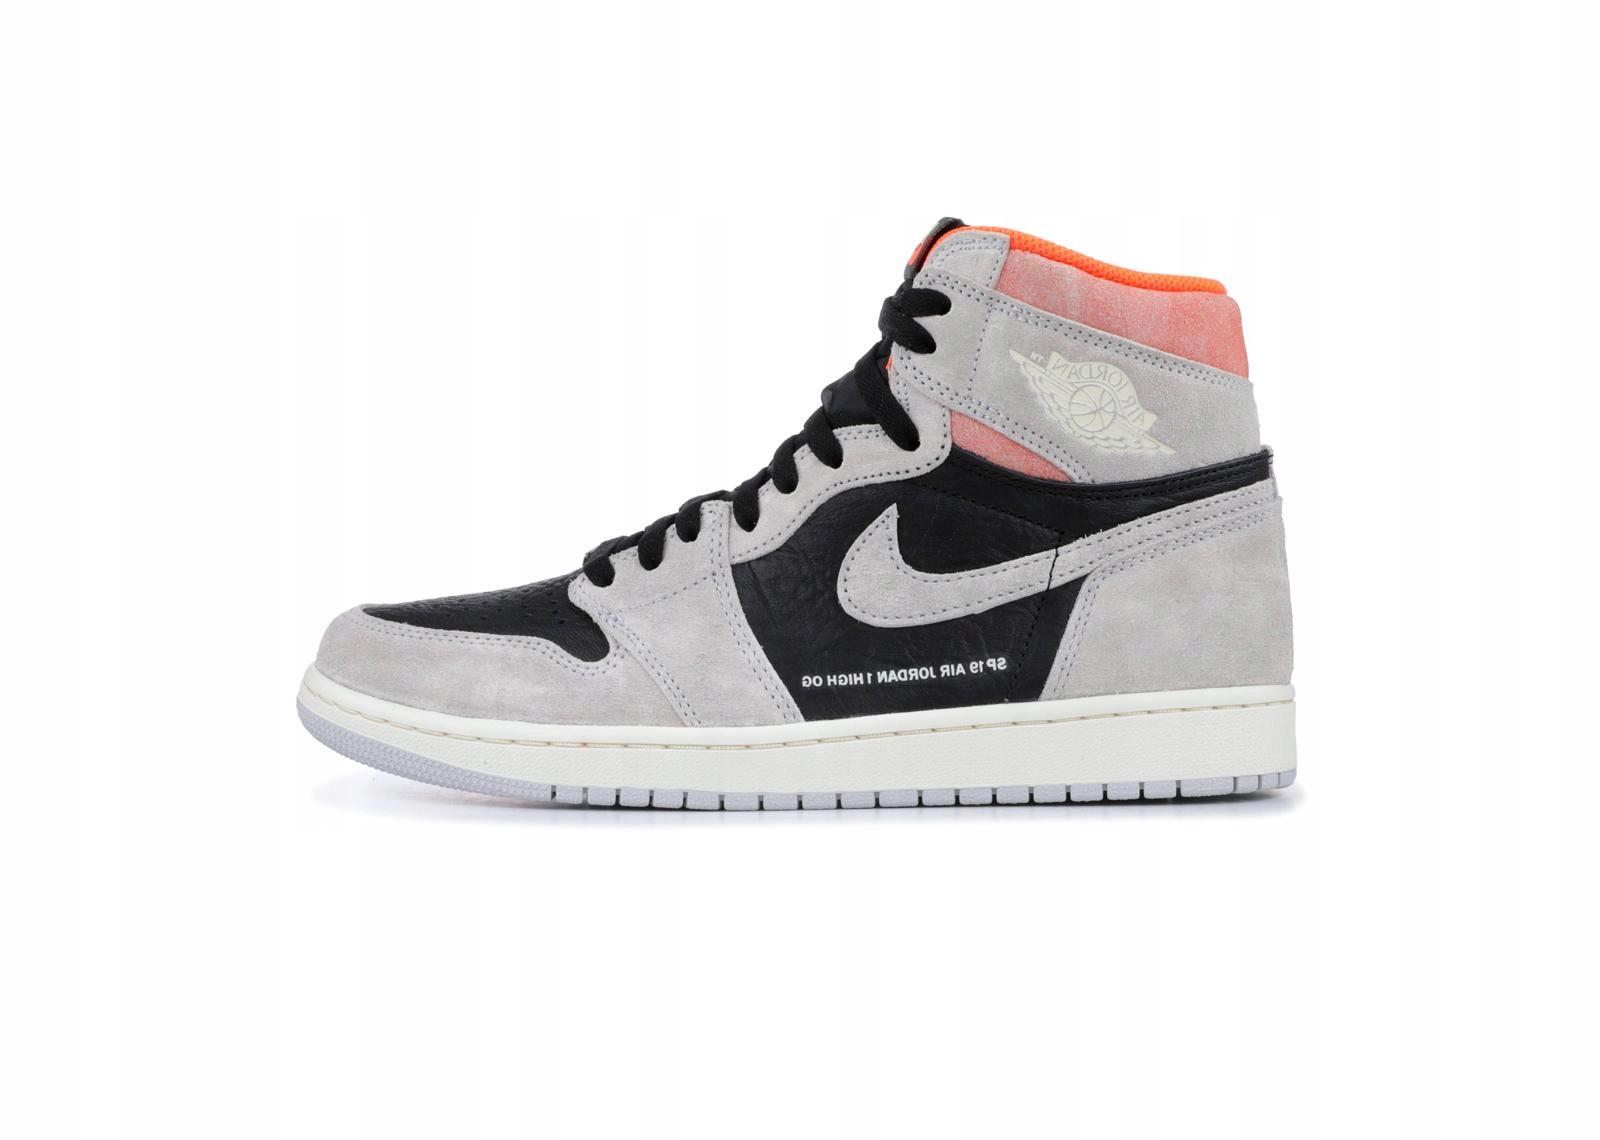 Tenisky Nike Air Jordan 1 OG Hi Retro